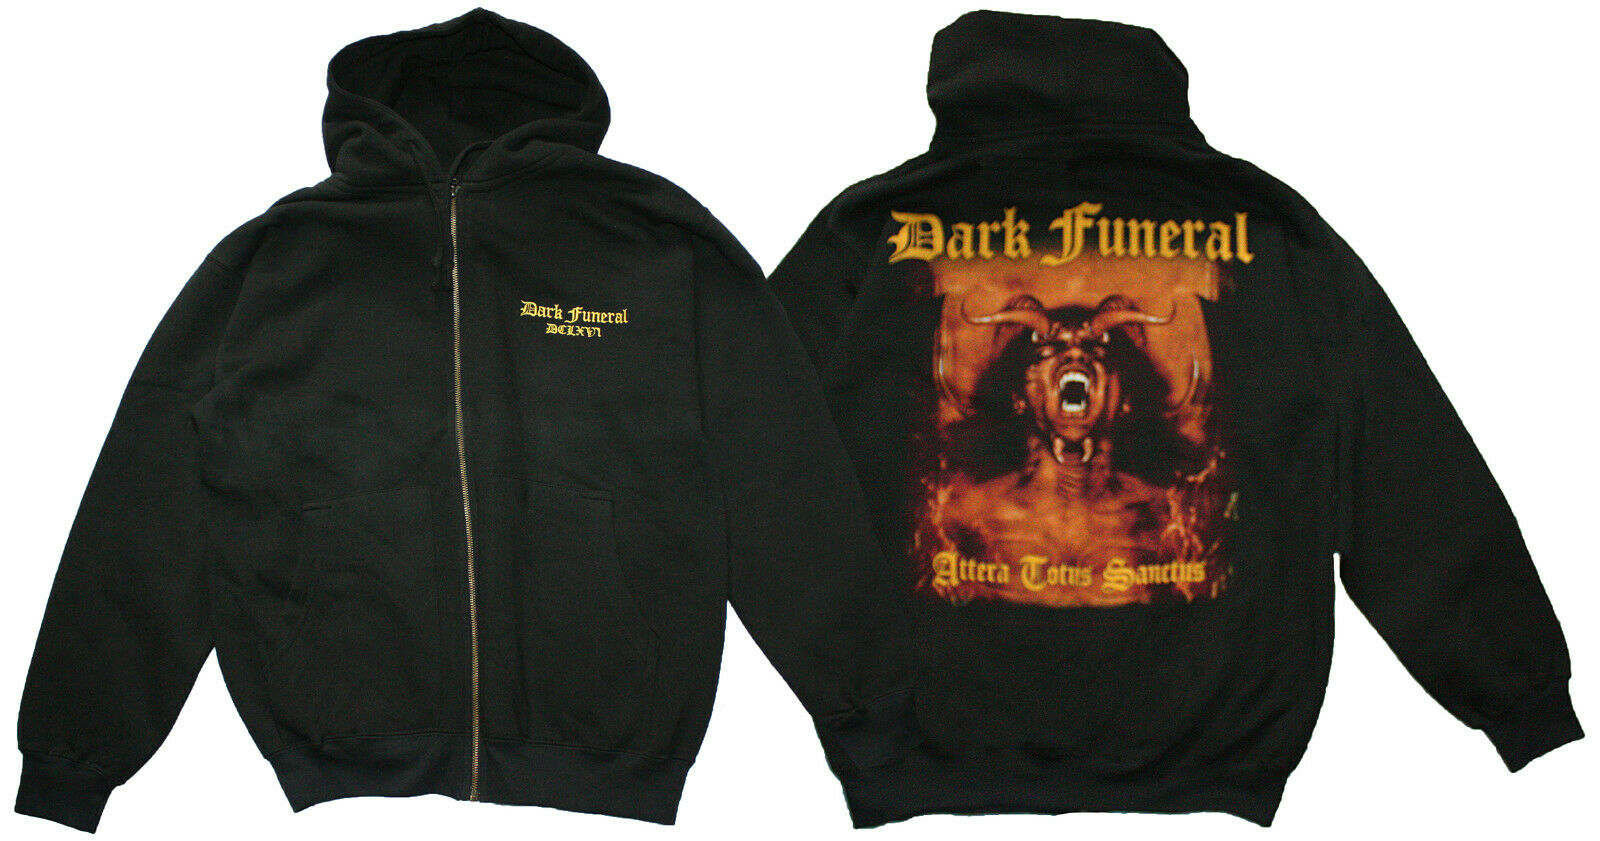 DARK FUNERAL merch official hoodie BLACK DEATH metal rock alt fashion SIZE M/L